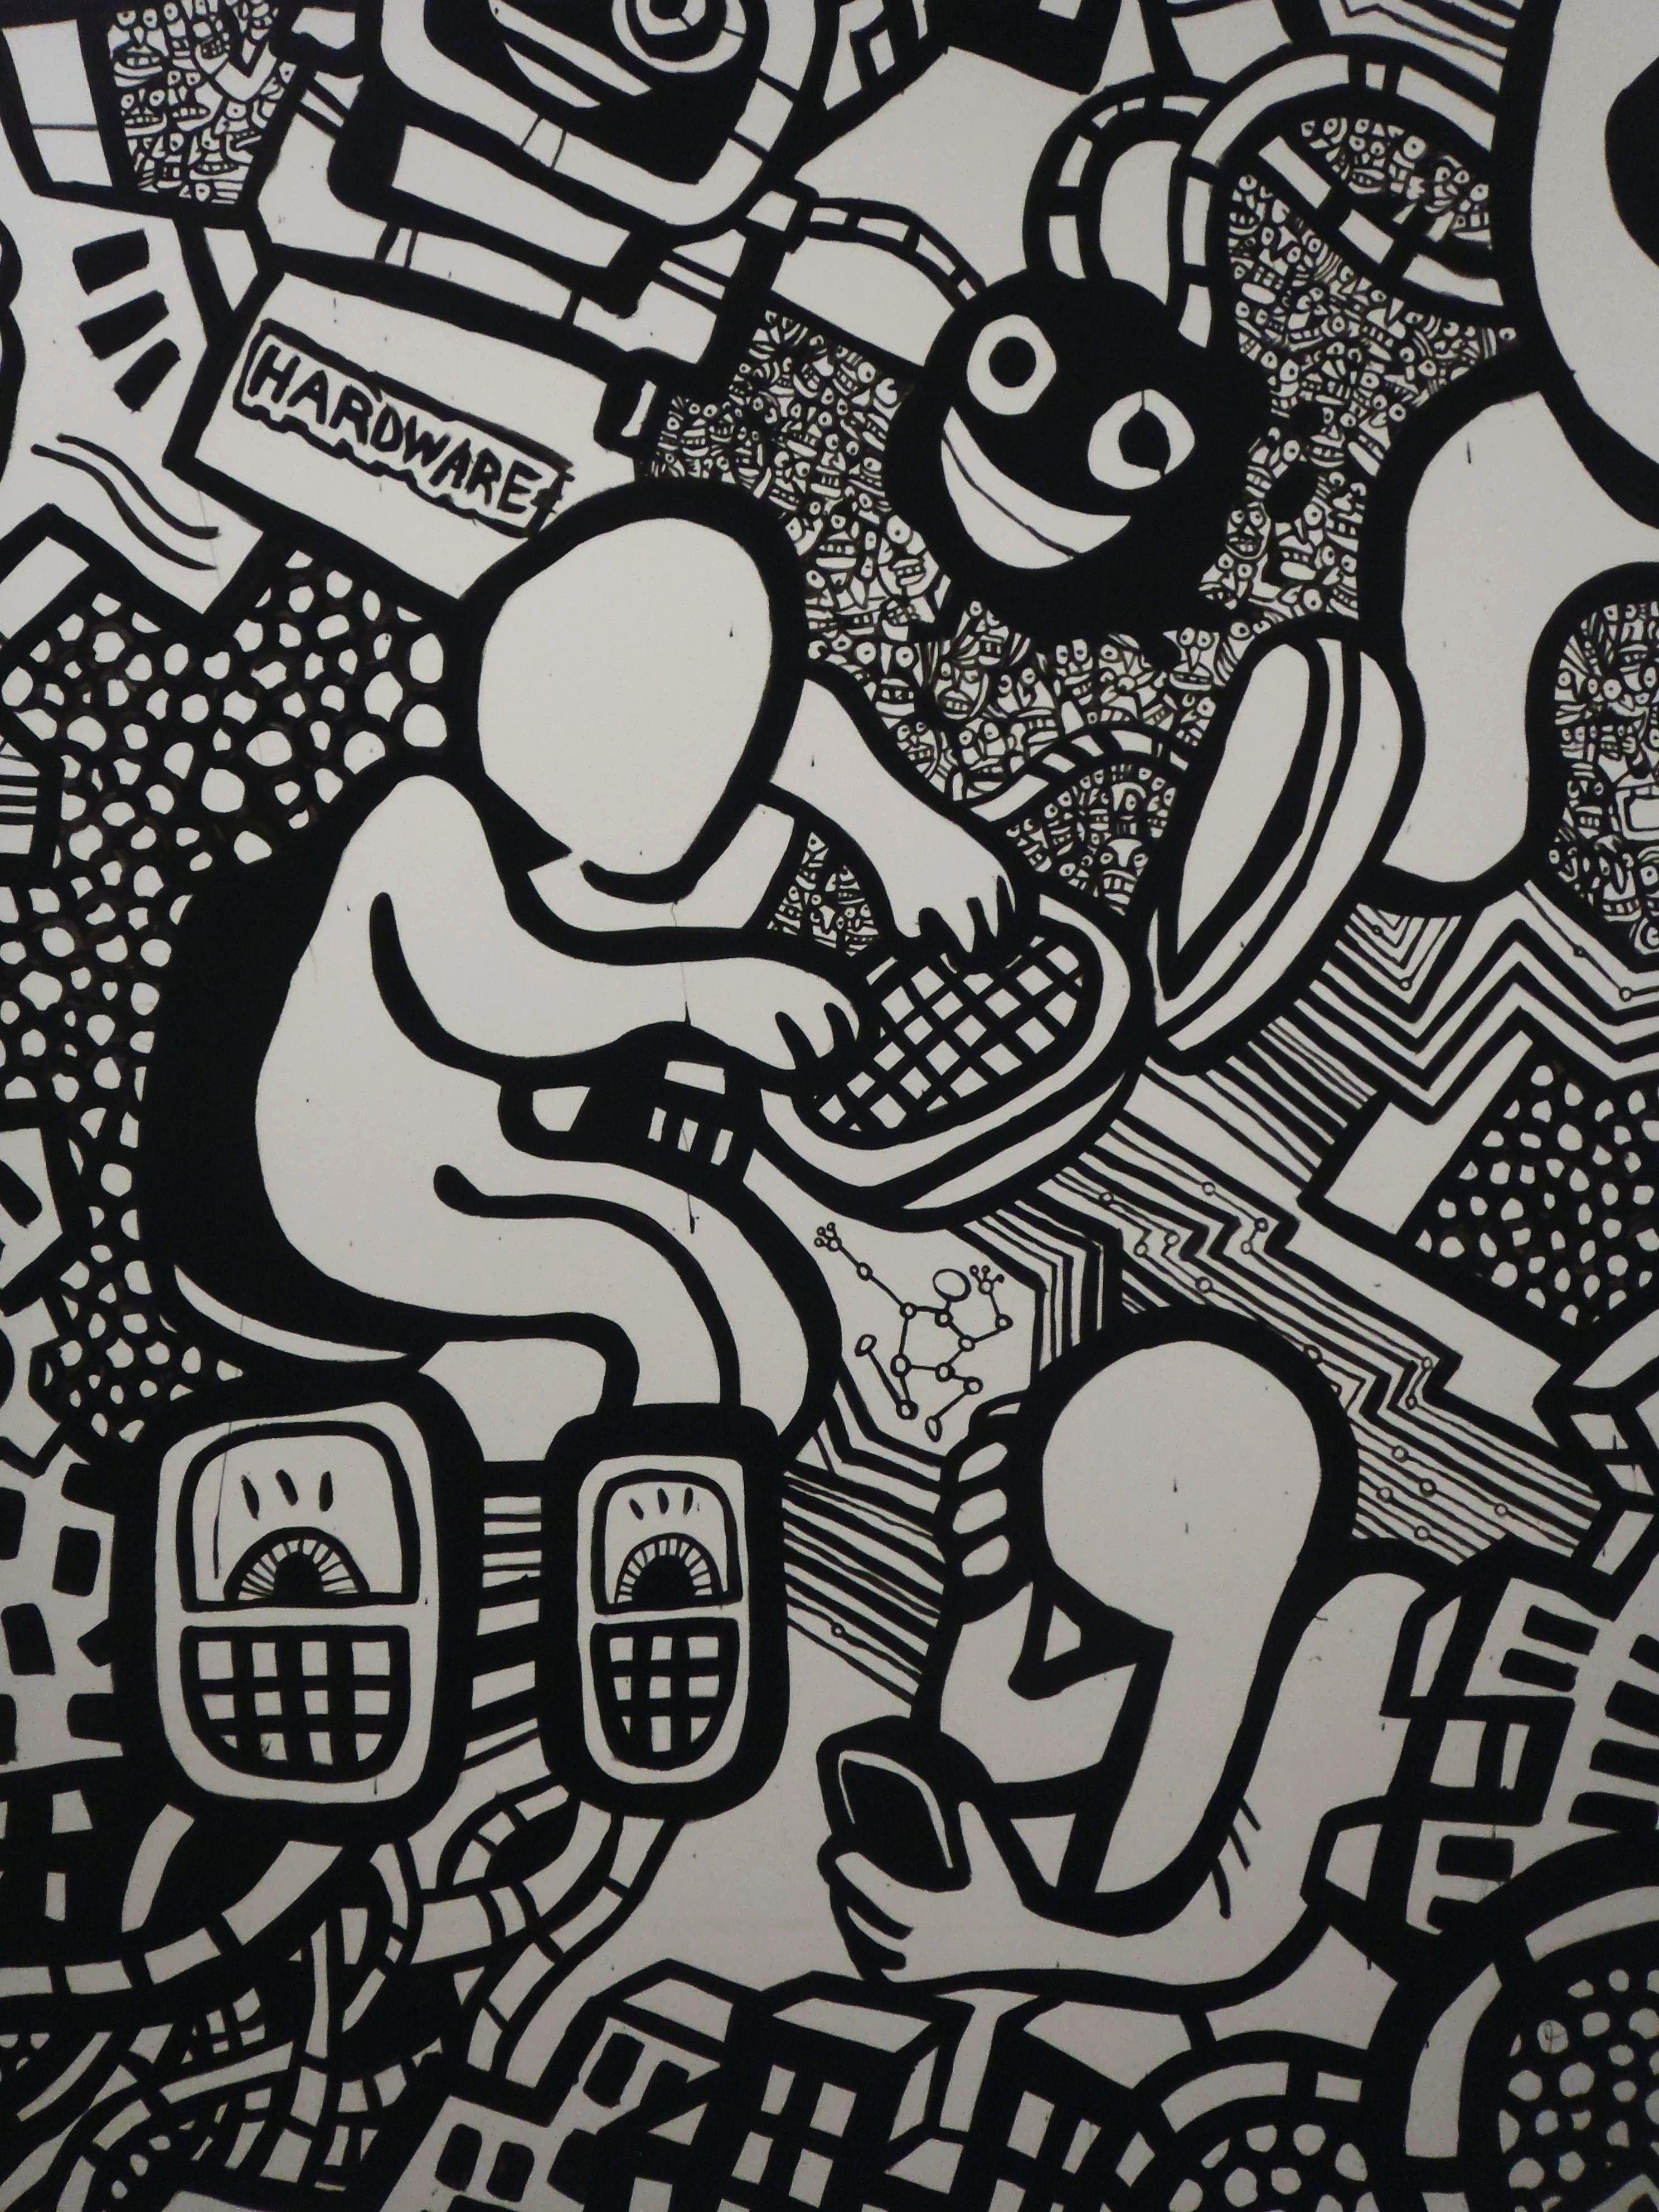 Graffiti Ausmalbilder Namen Neu 45 Inspirierend Ausmalbilder Graffiti Love Mickeycarrollmunchkin Stock